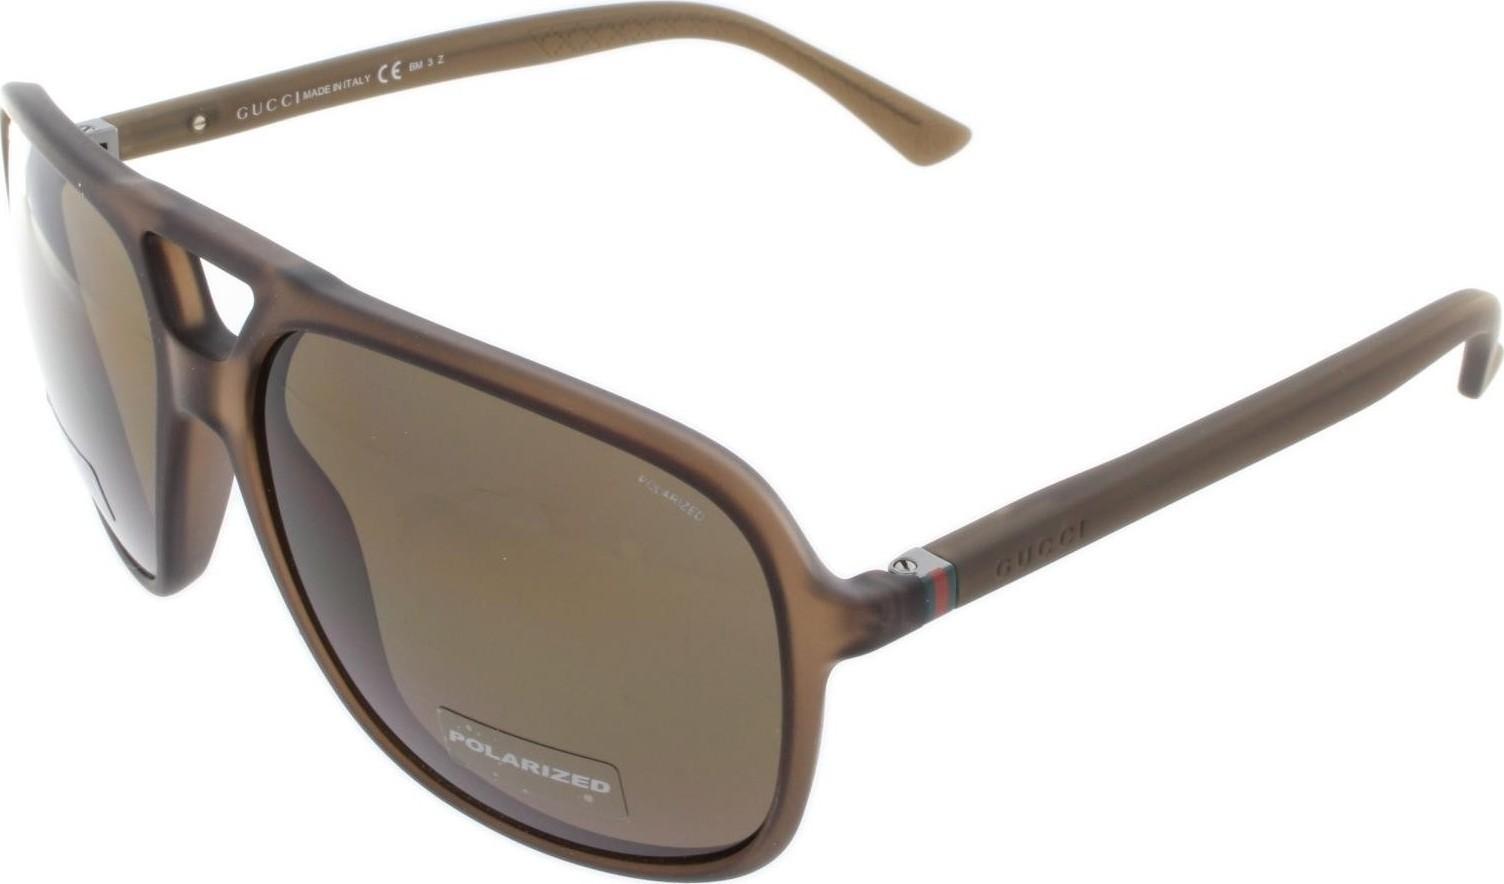 Gucci Gg 1091/s B00 (sp) sSrLzDRR